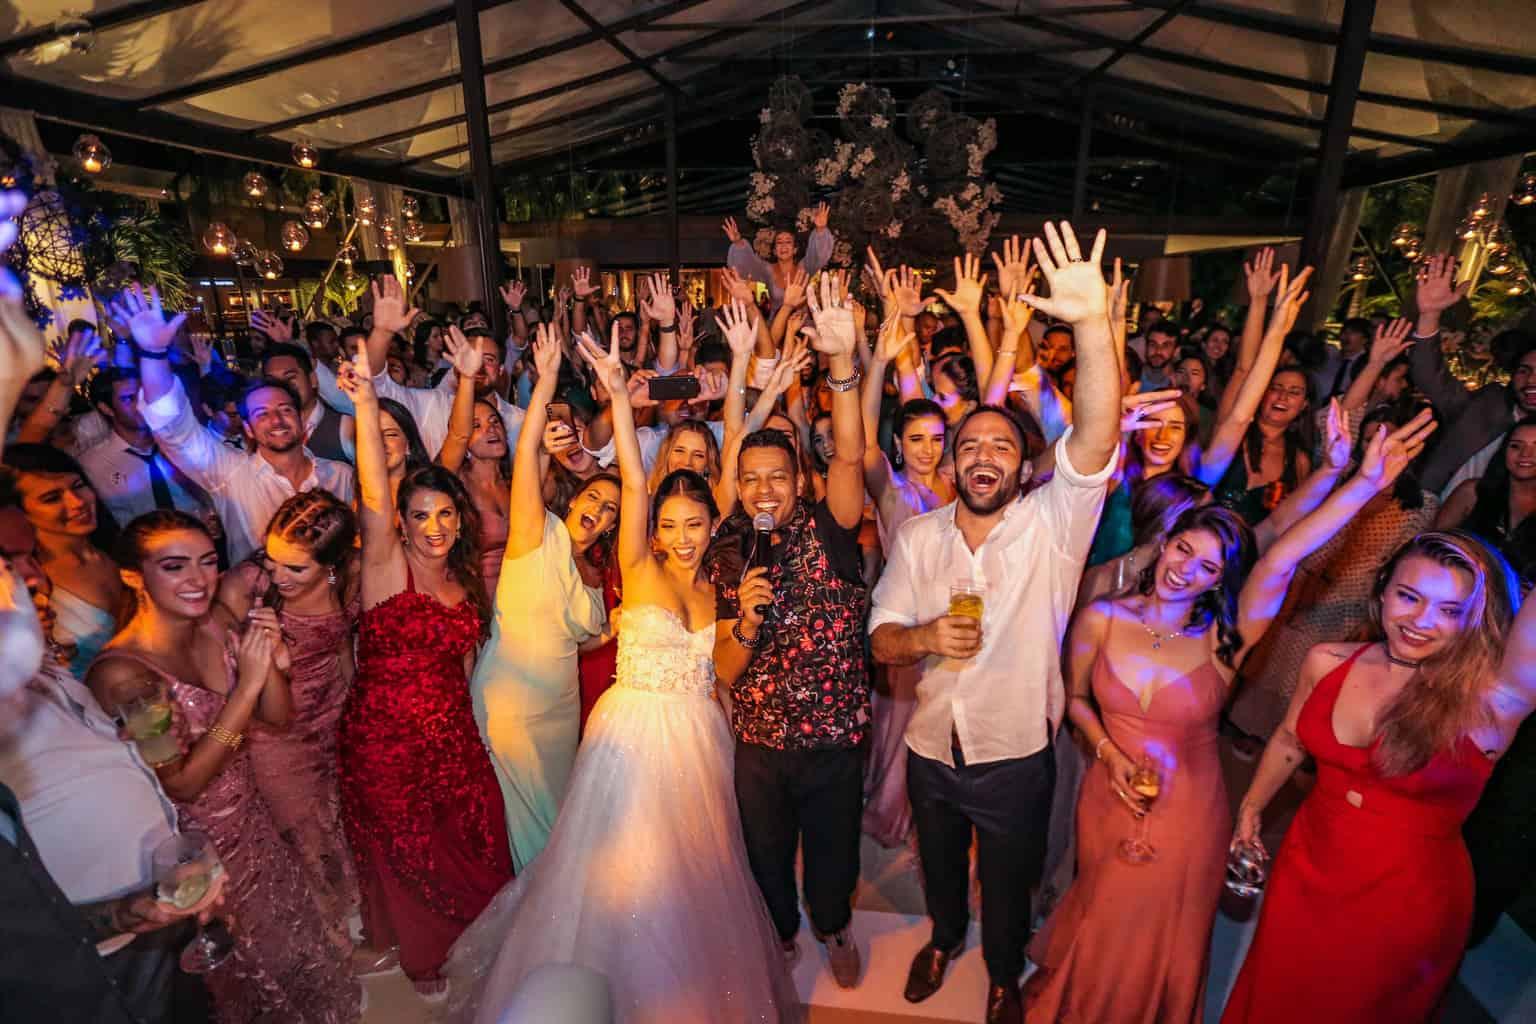 Casamento-Alissa-e-Gustavo-Cerimonial-Manu-Goncalez-Decor-Andrea-Kapps-Fasano-Angra-dos-Reis-Foto-VRebel-DJ-Jimmy-festa6554